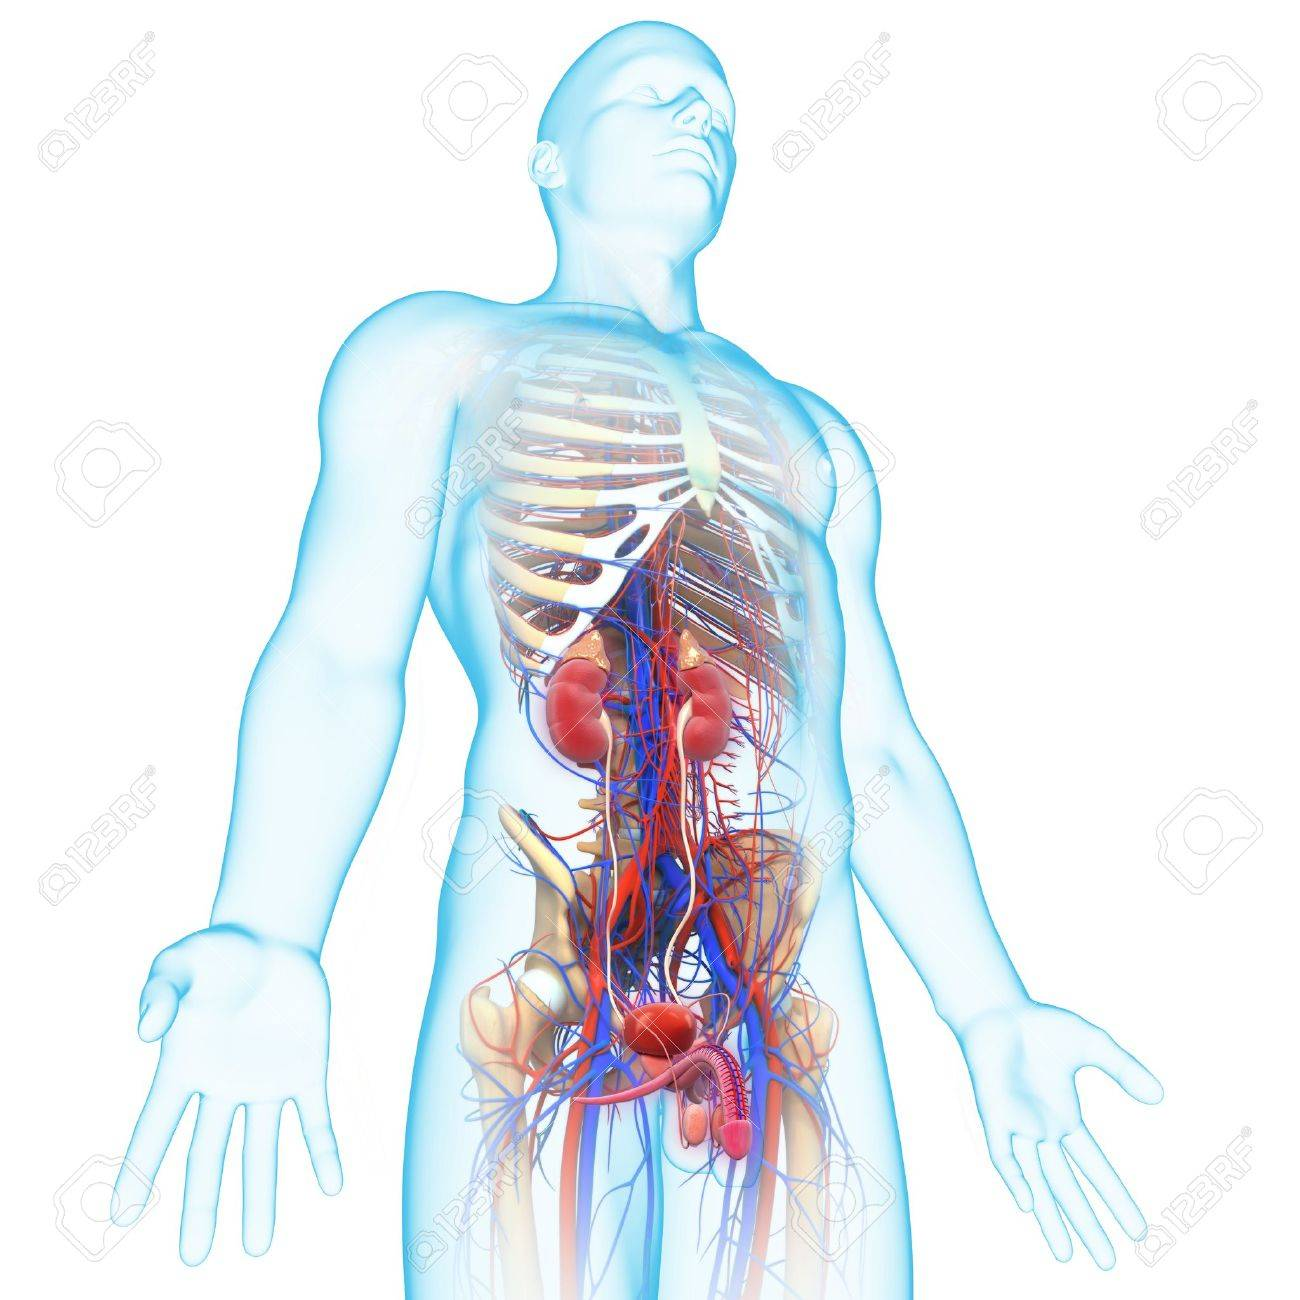 Side View Anatomy Side View of Human Urinary